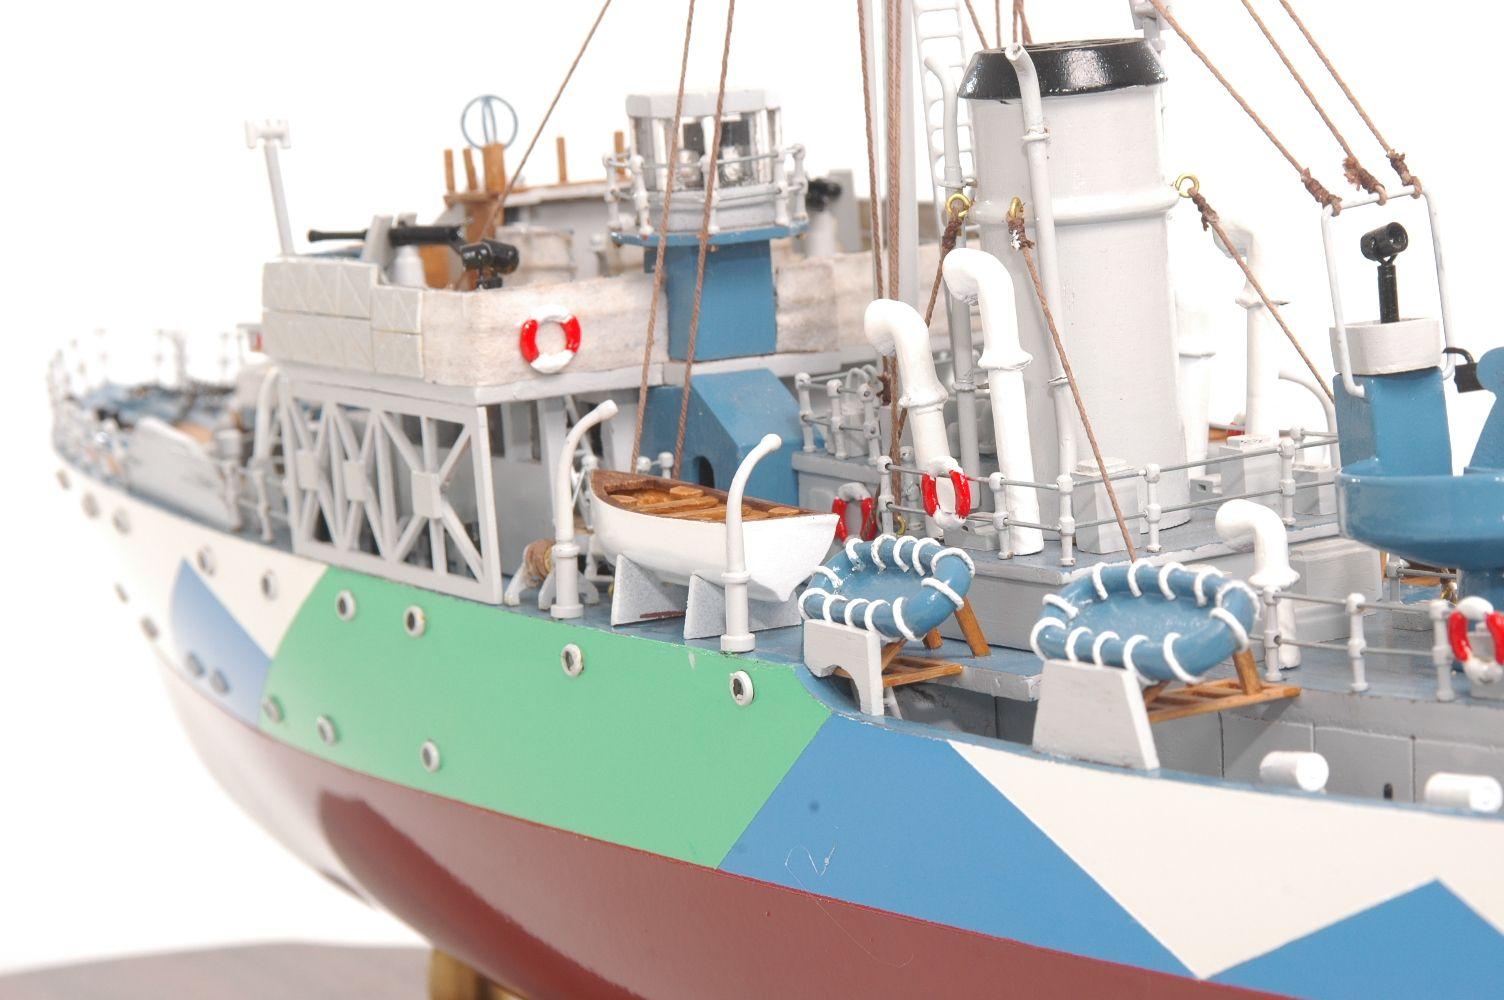 473-8730-Montbretia-Model-War-Ship